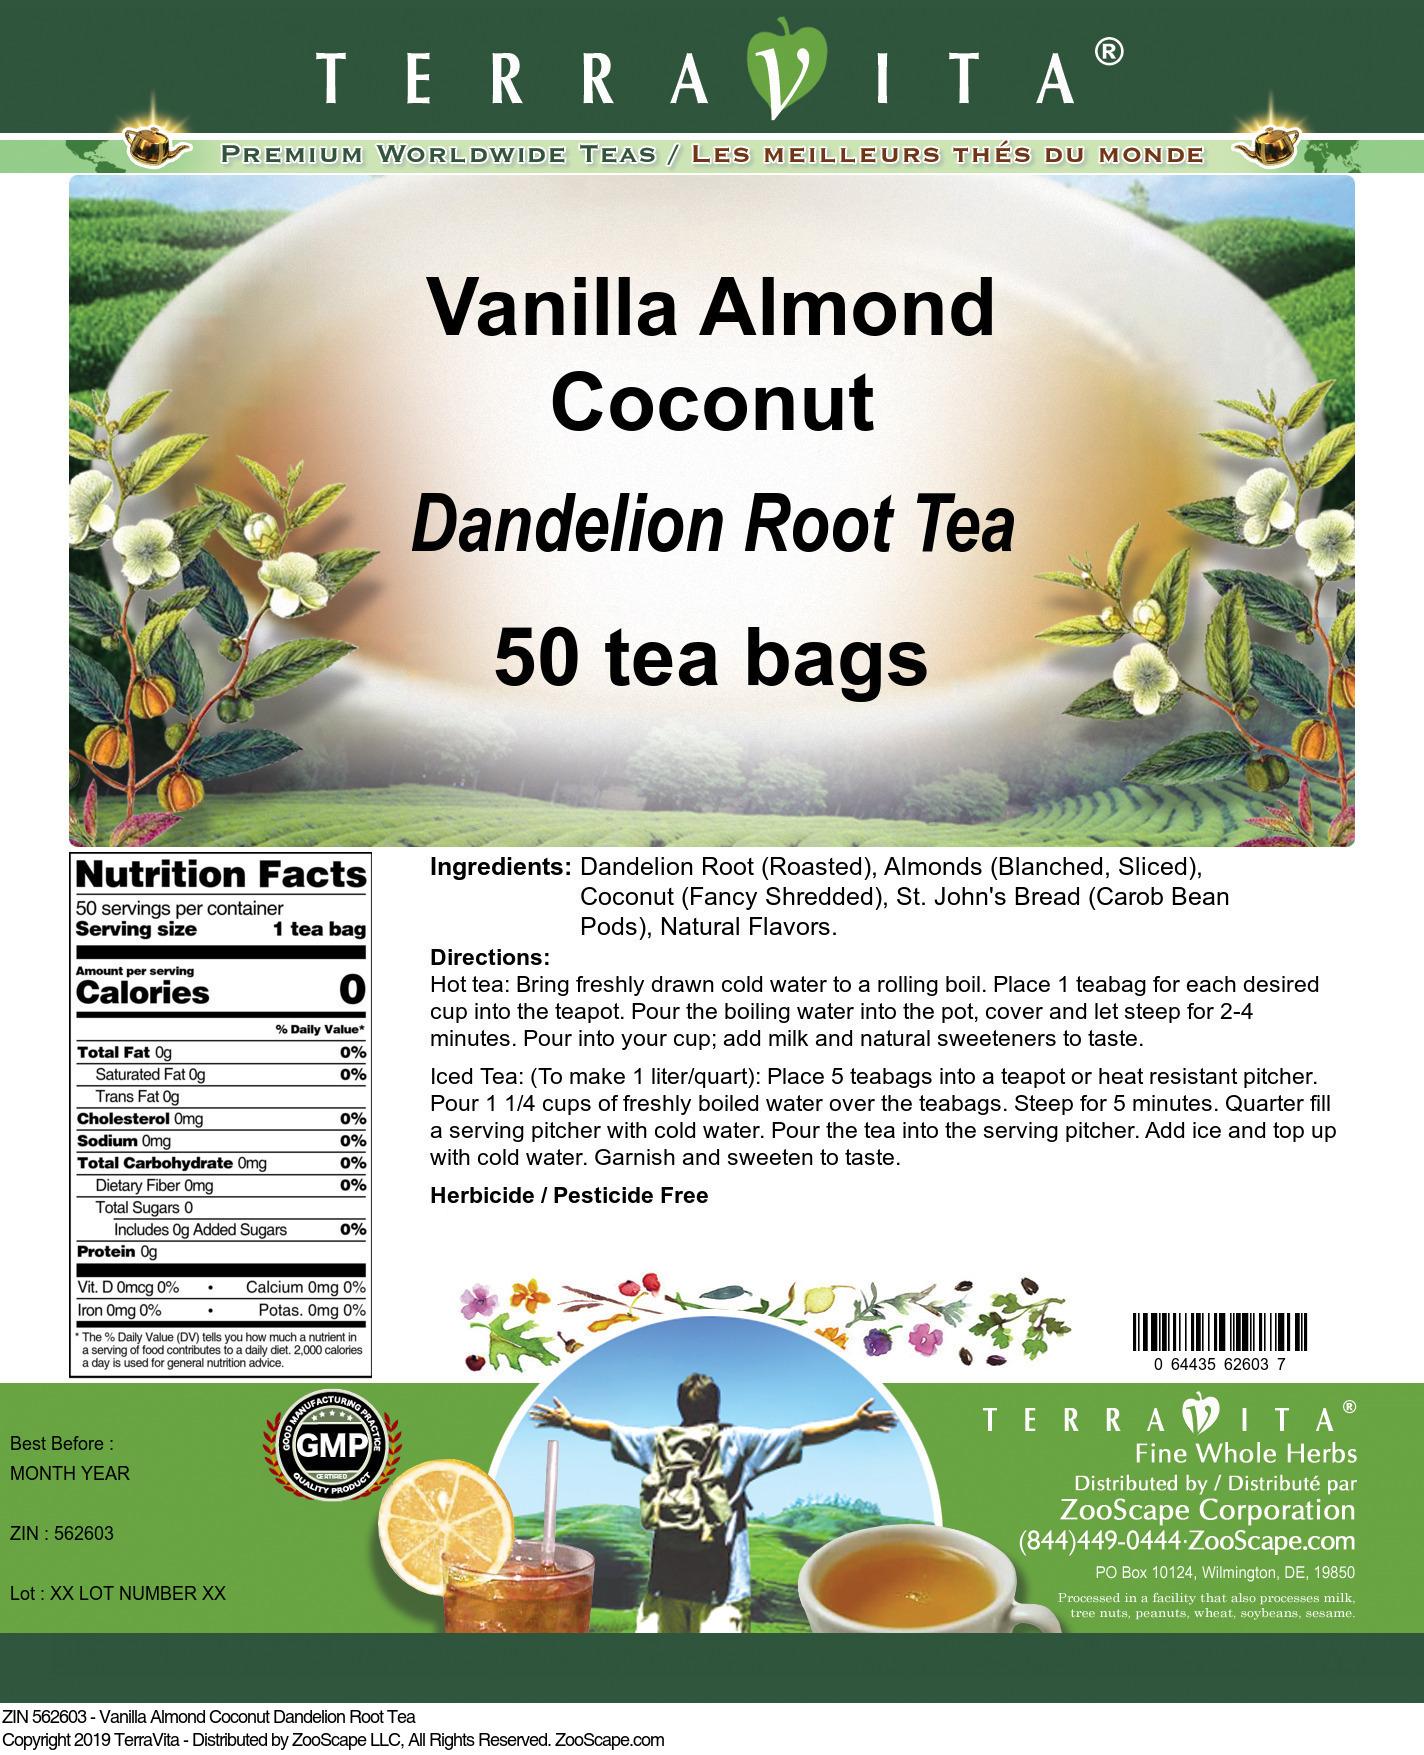 Vanilla Almond Coconut Dandelion Root